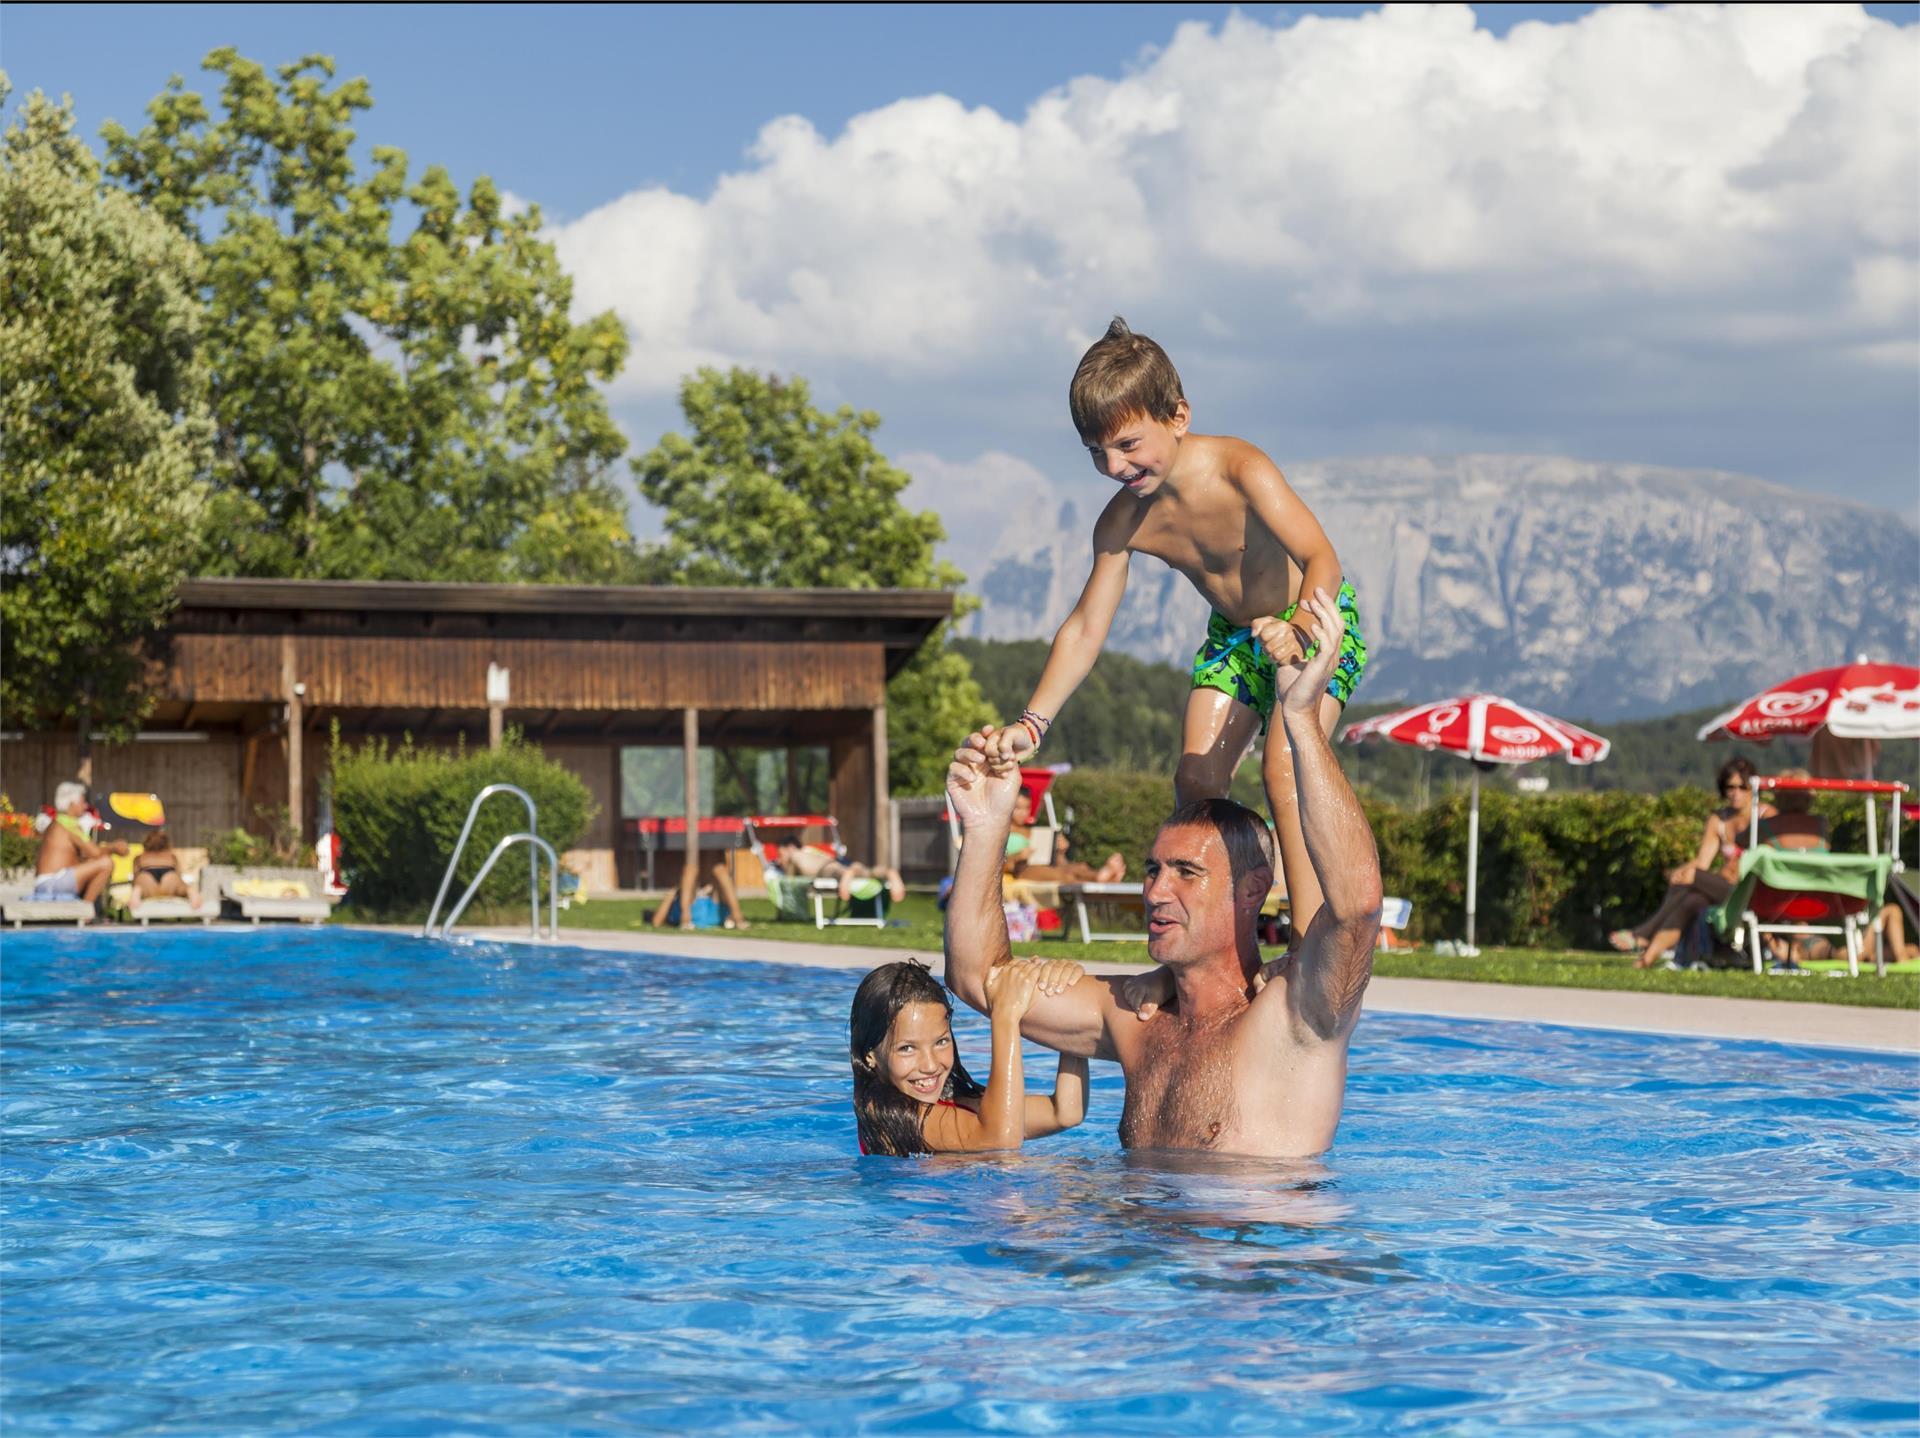 Tourismusverein-Ritten_Fotograf-Tiberio-Sorvillo